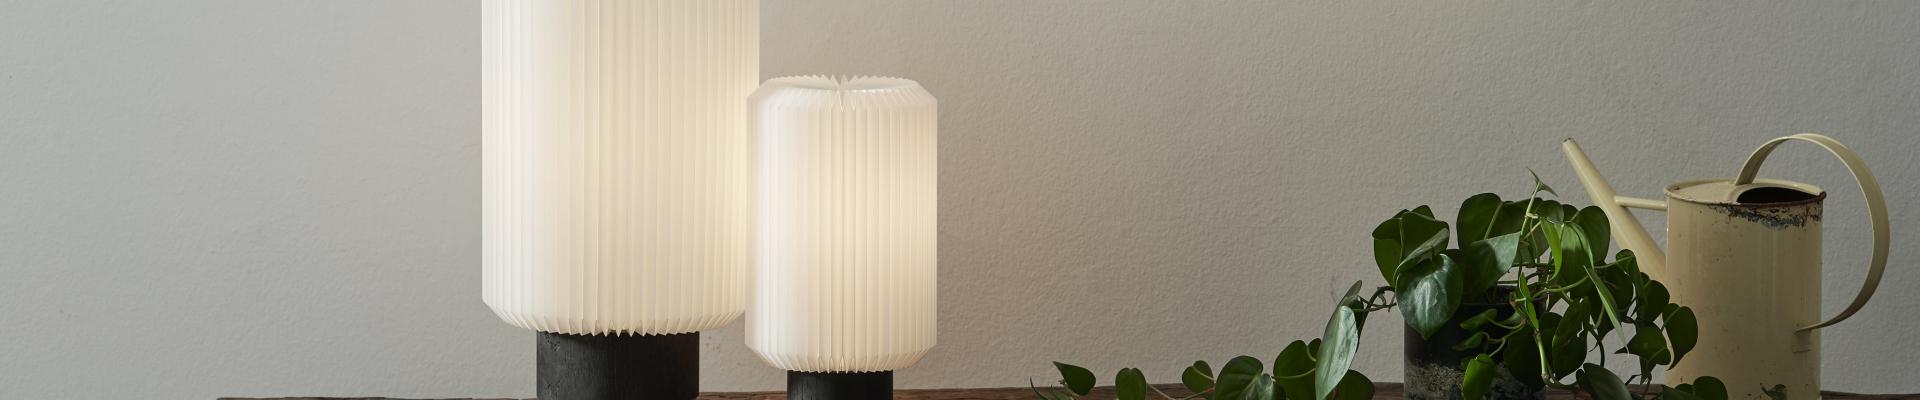 LE KLINT tafellampen